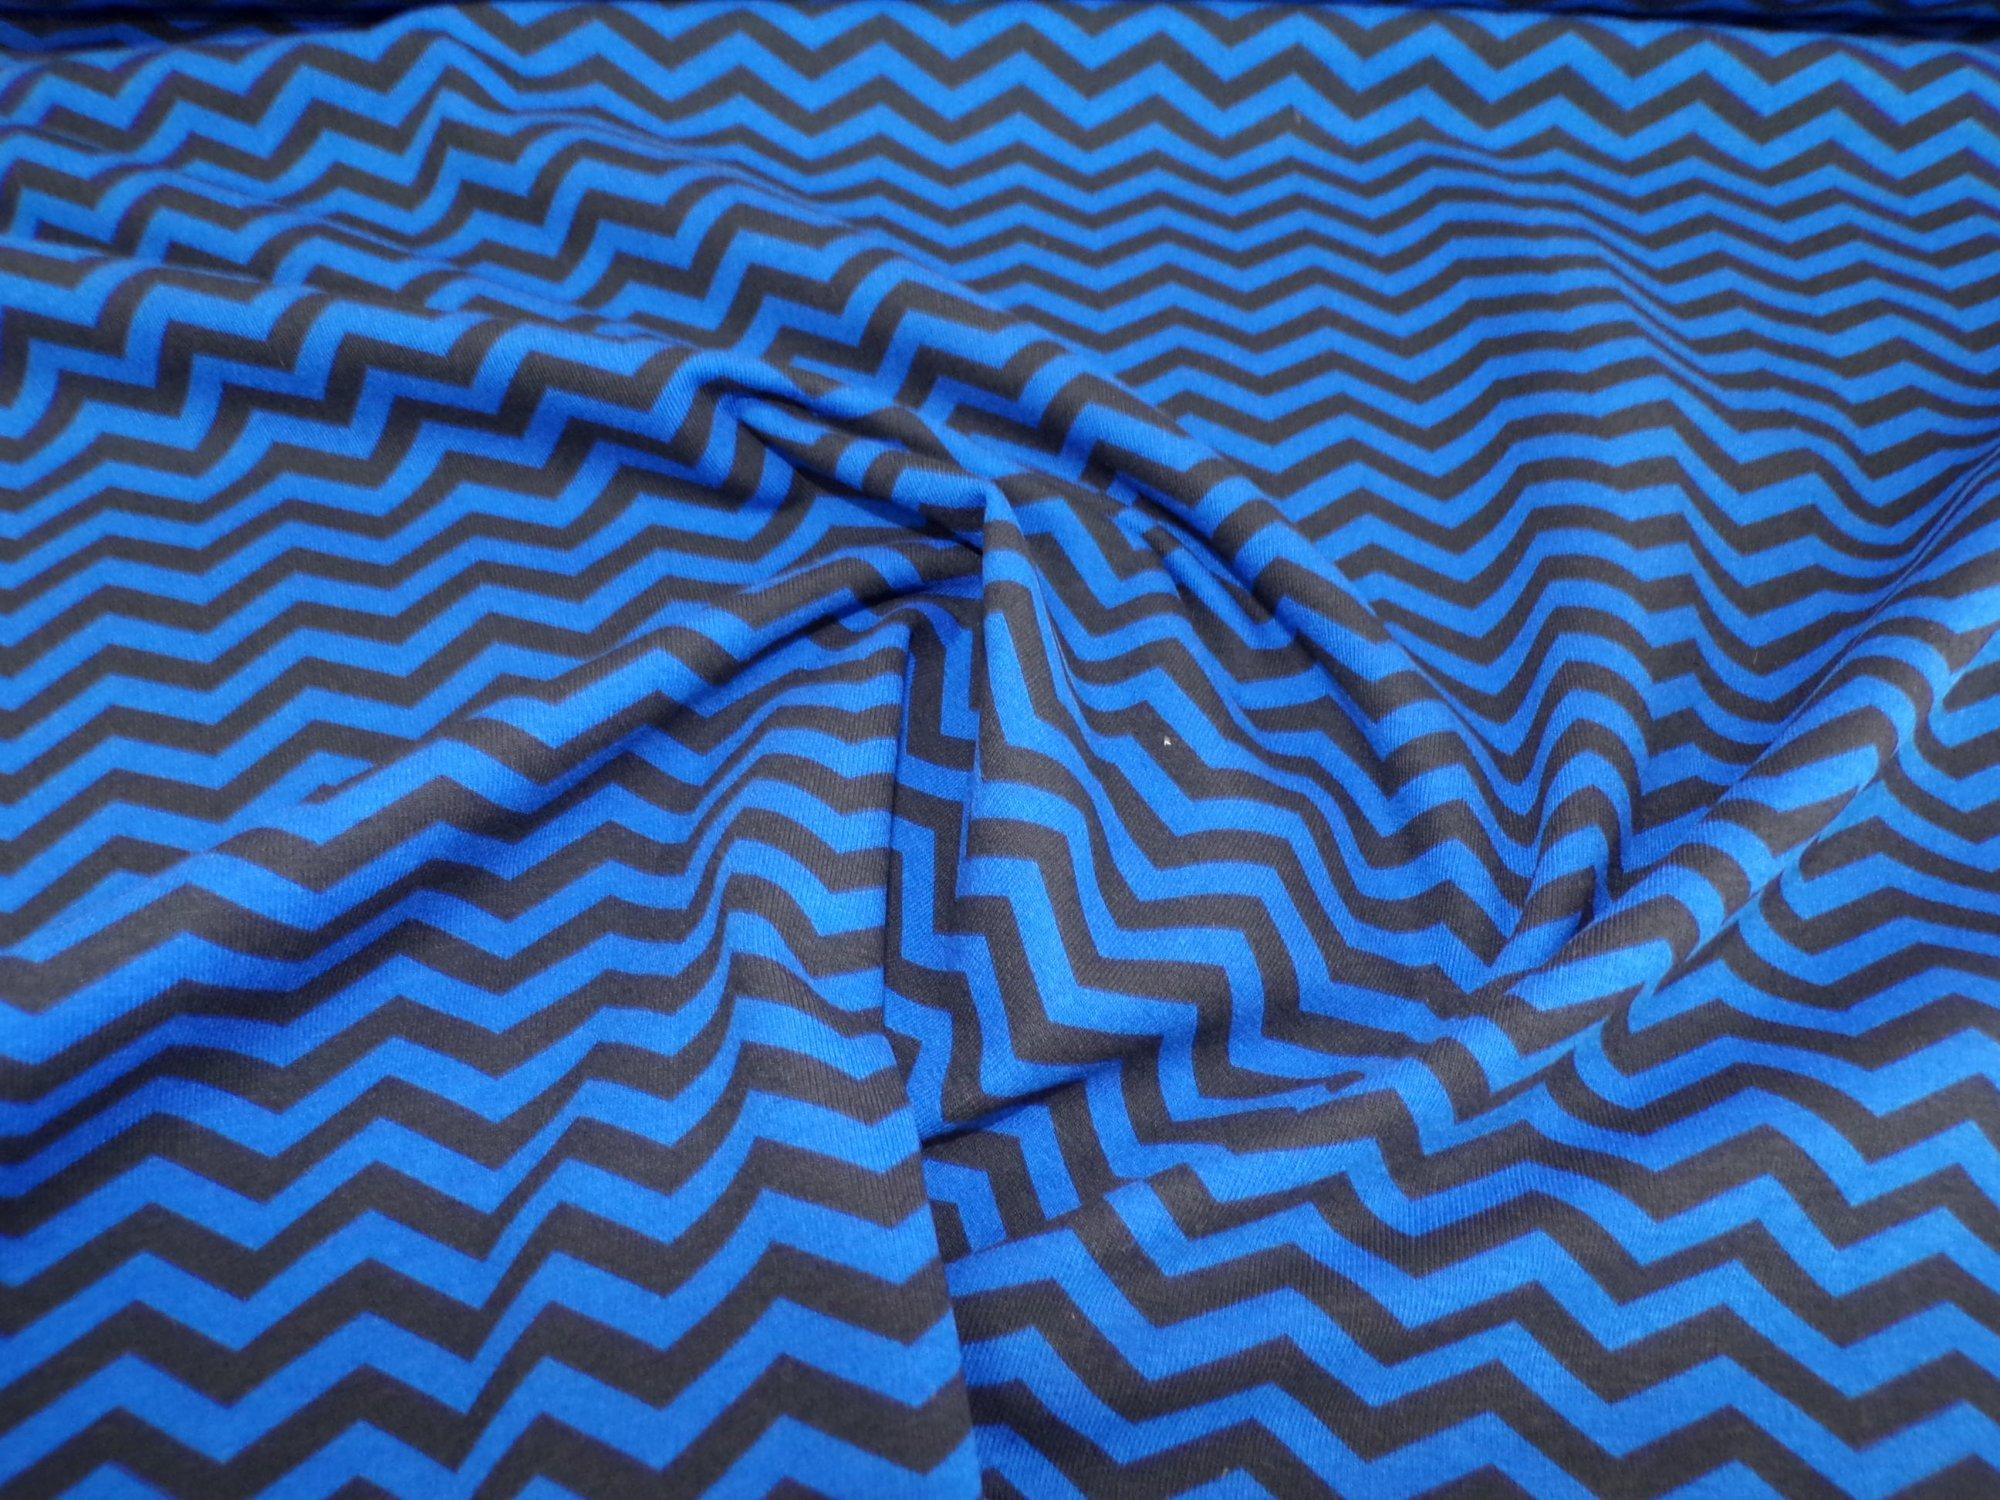 Cotton Lycra Jersey - Blue / Black Chevron